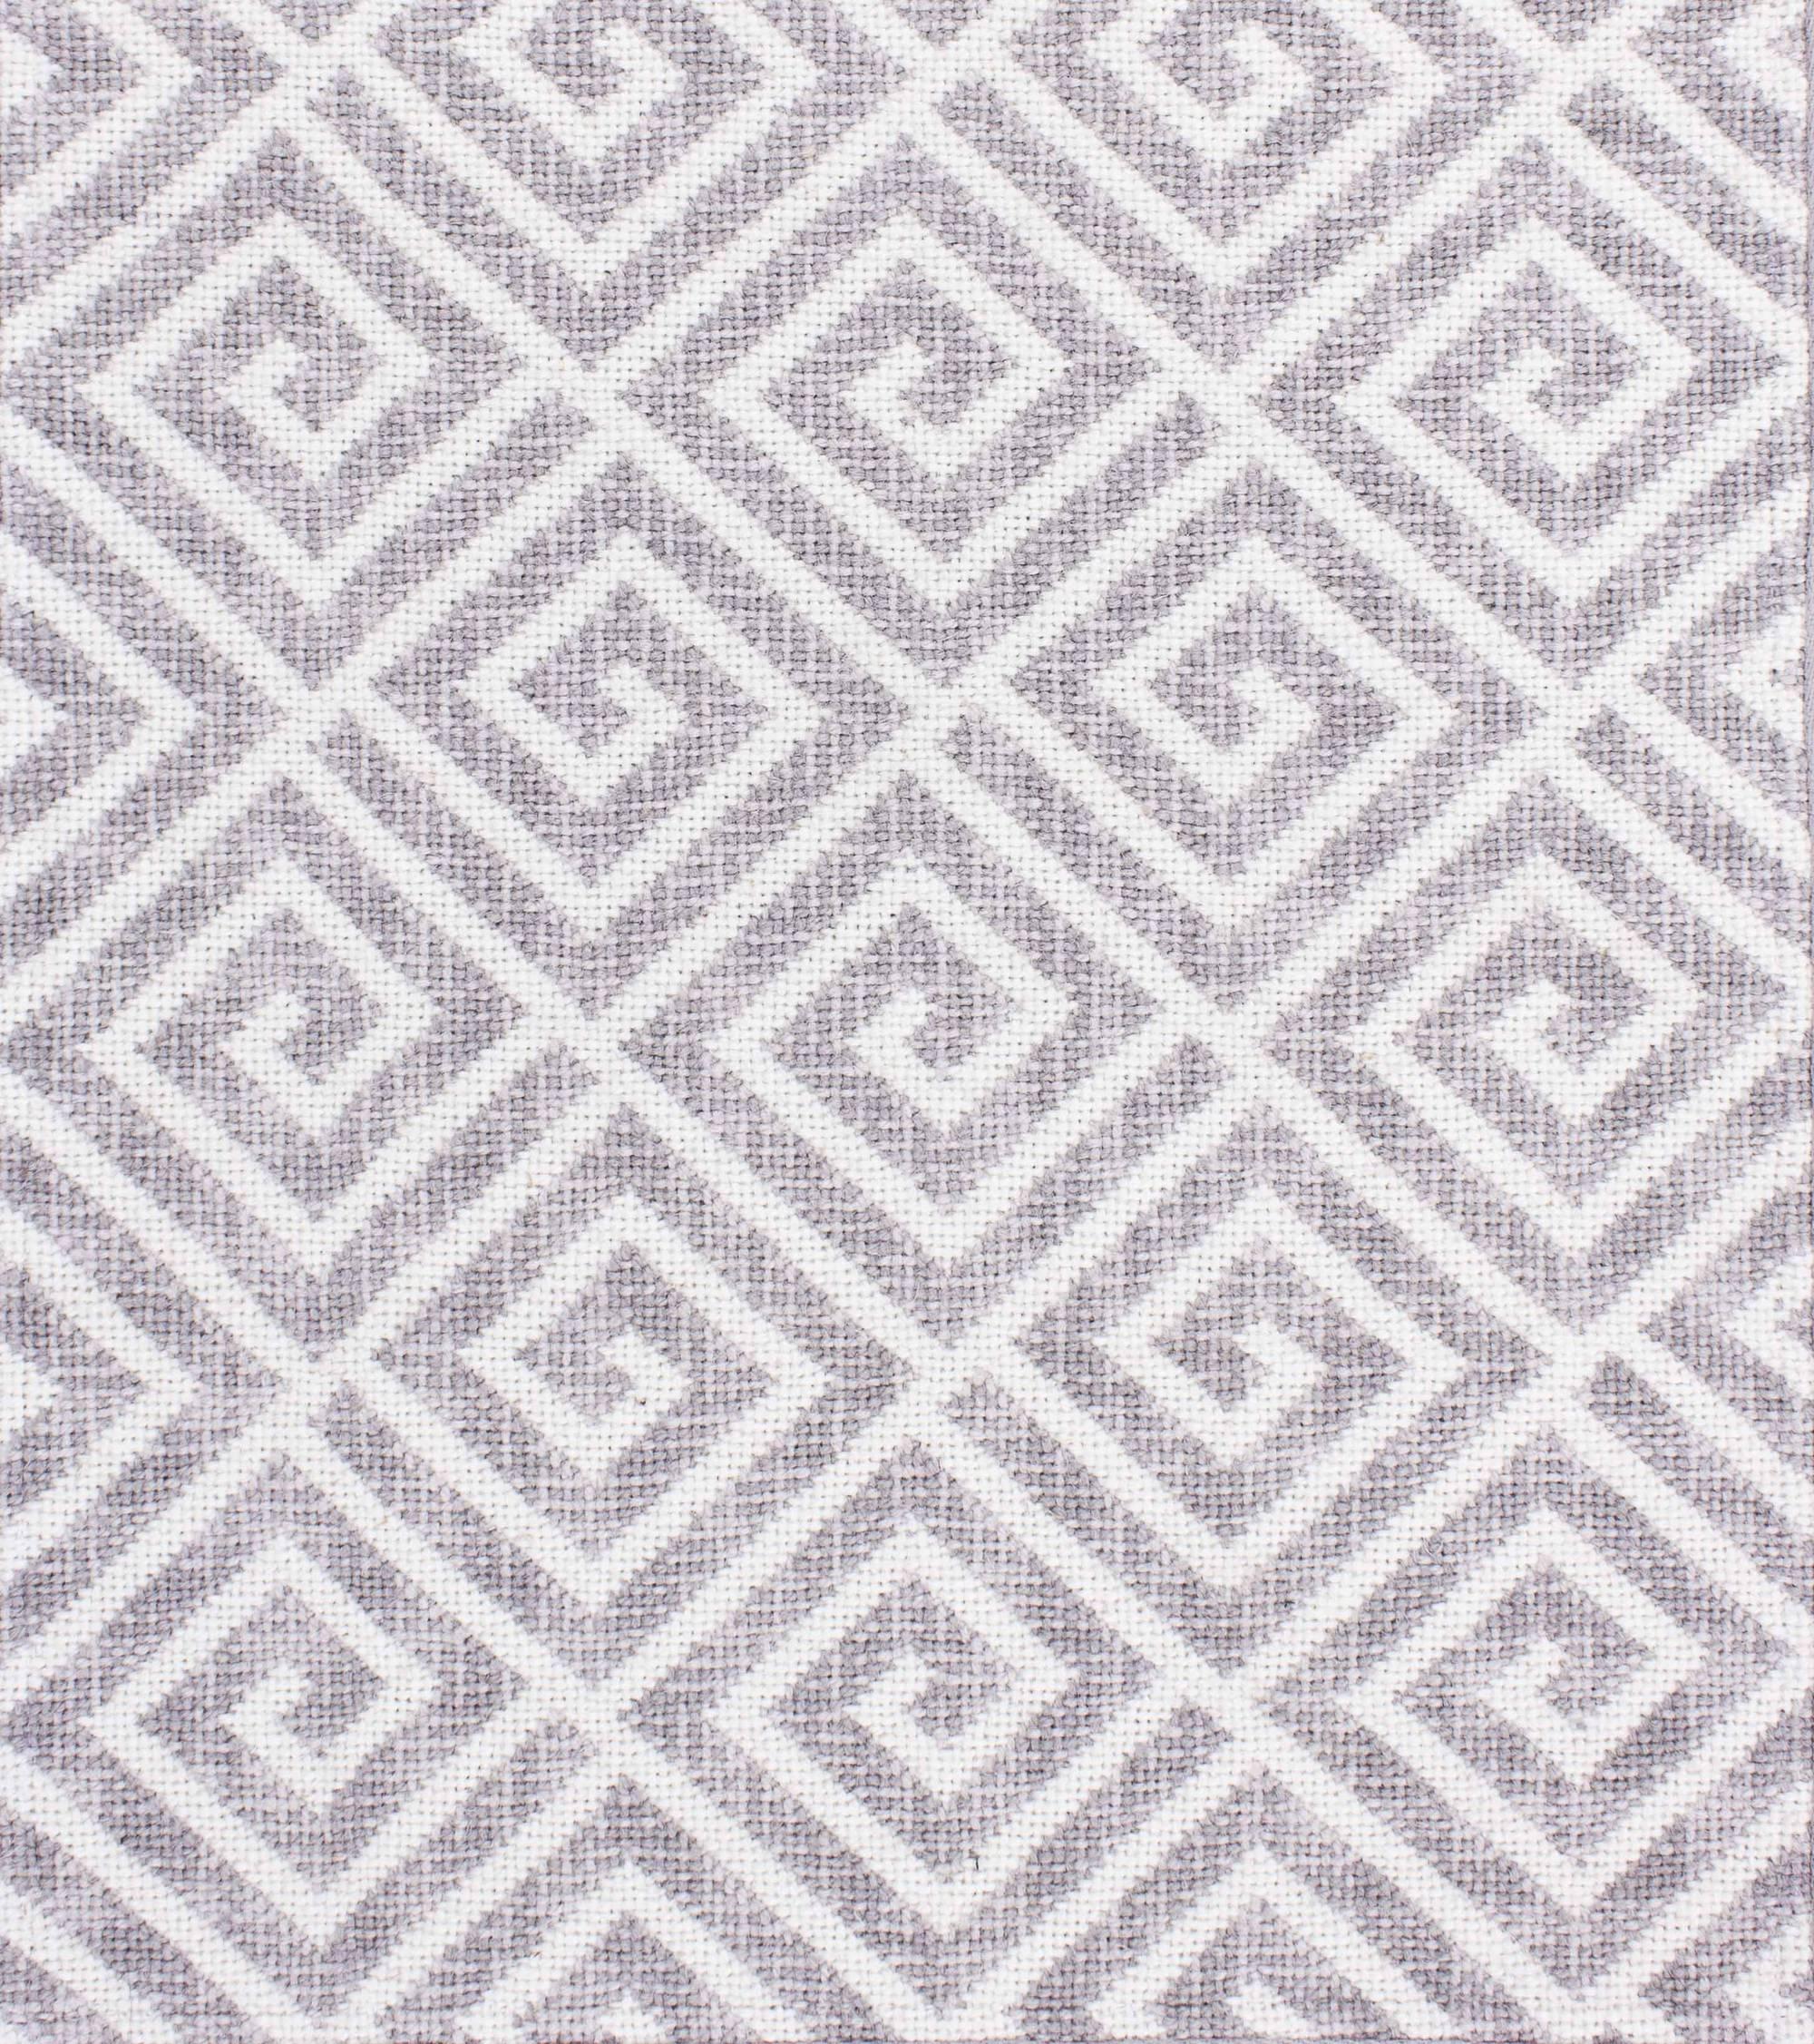 Double Weave: Maze